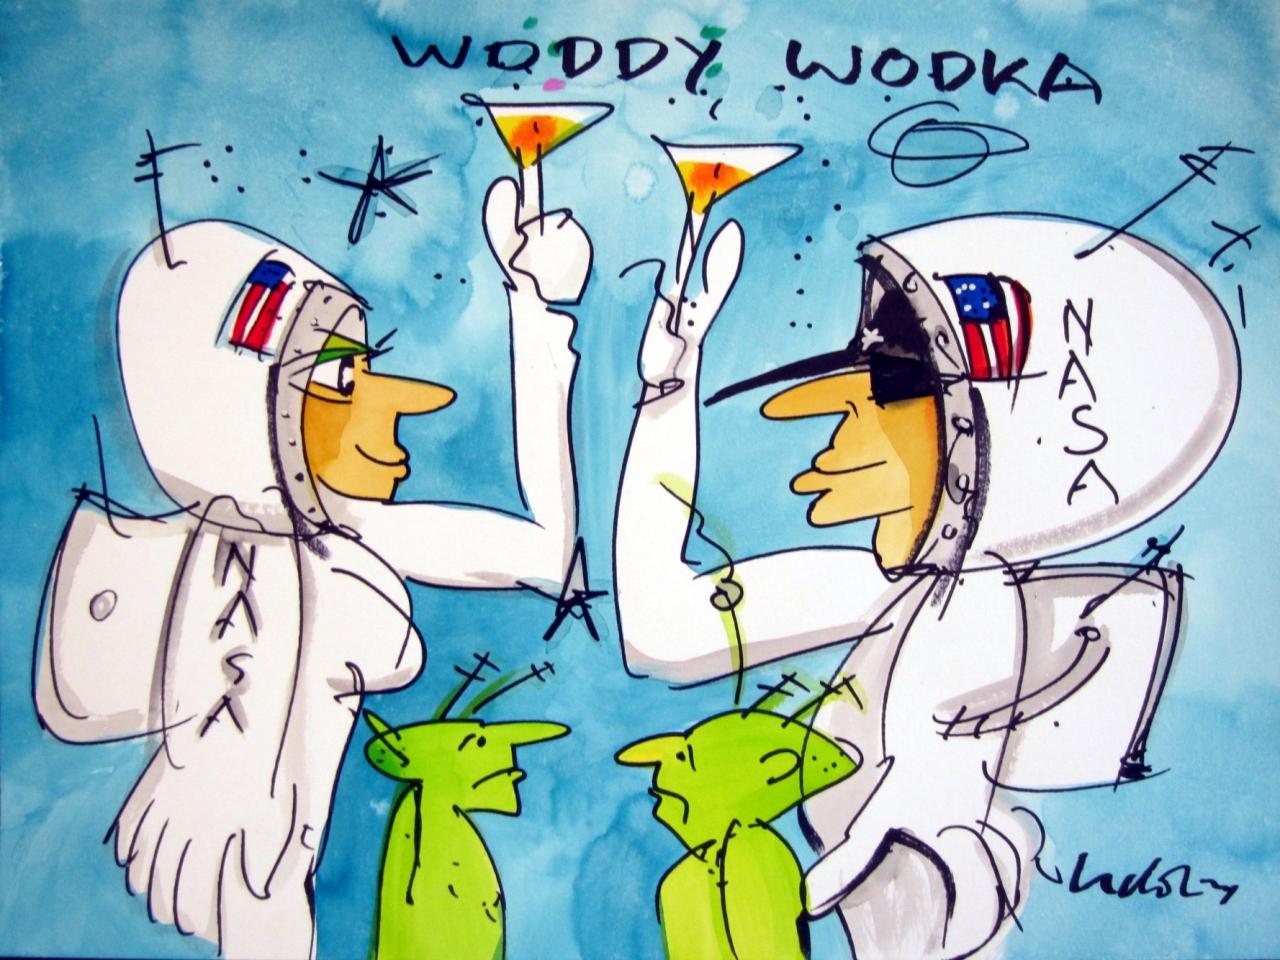 Woddy Wodka, groß 2012